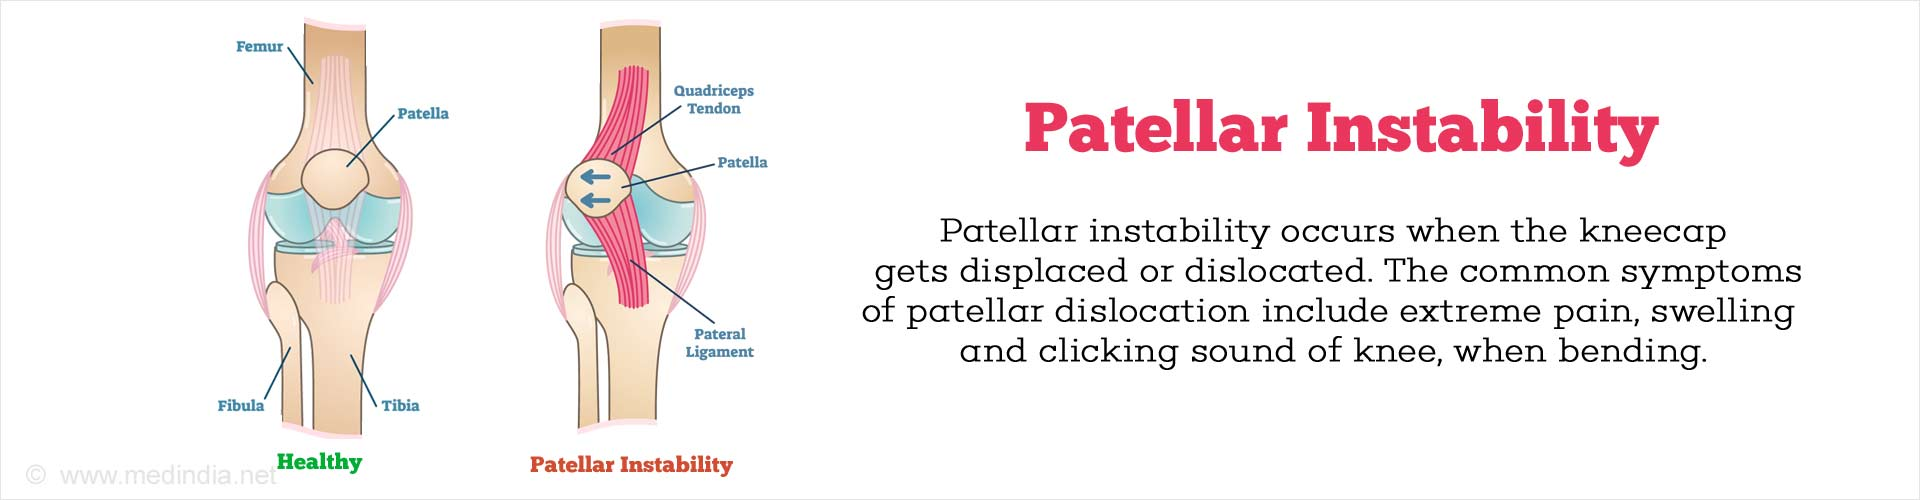 Patellar Instability